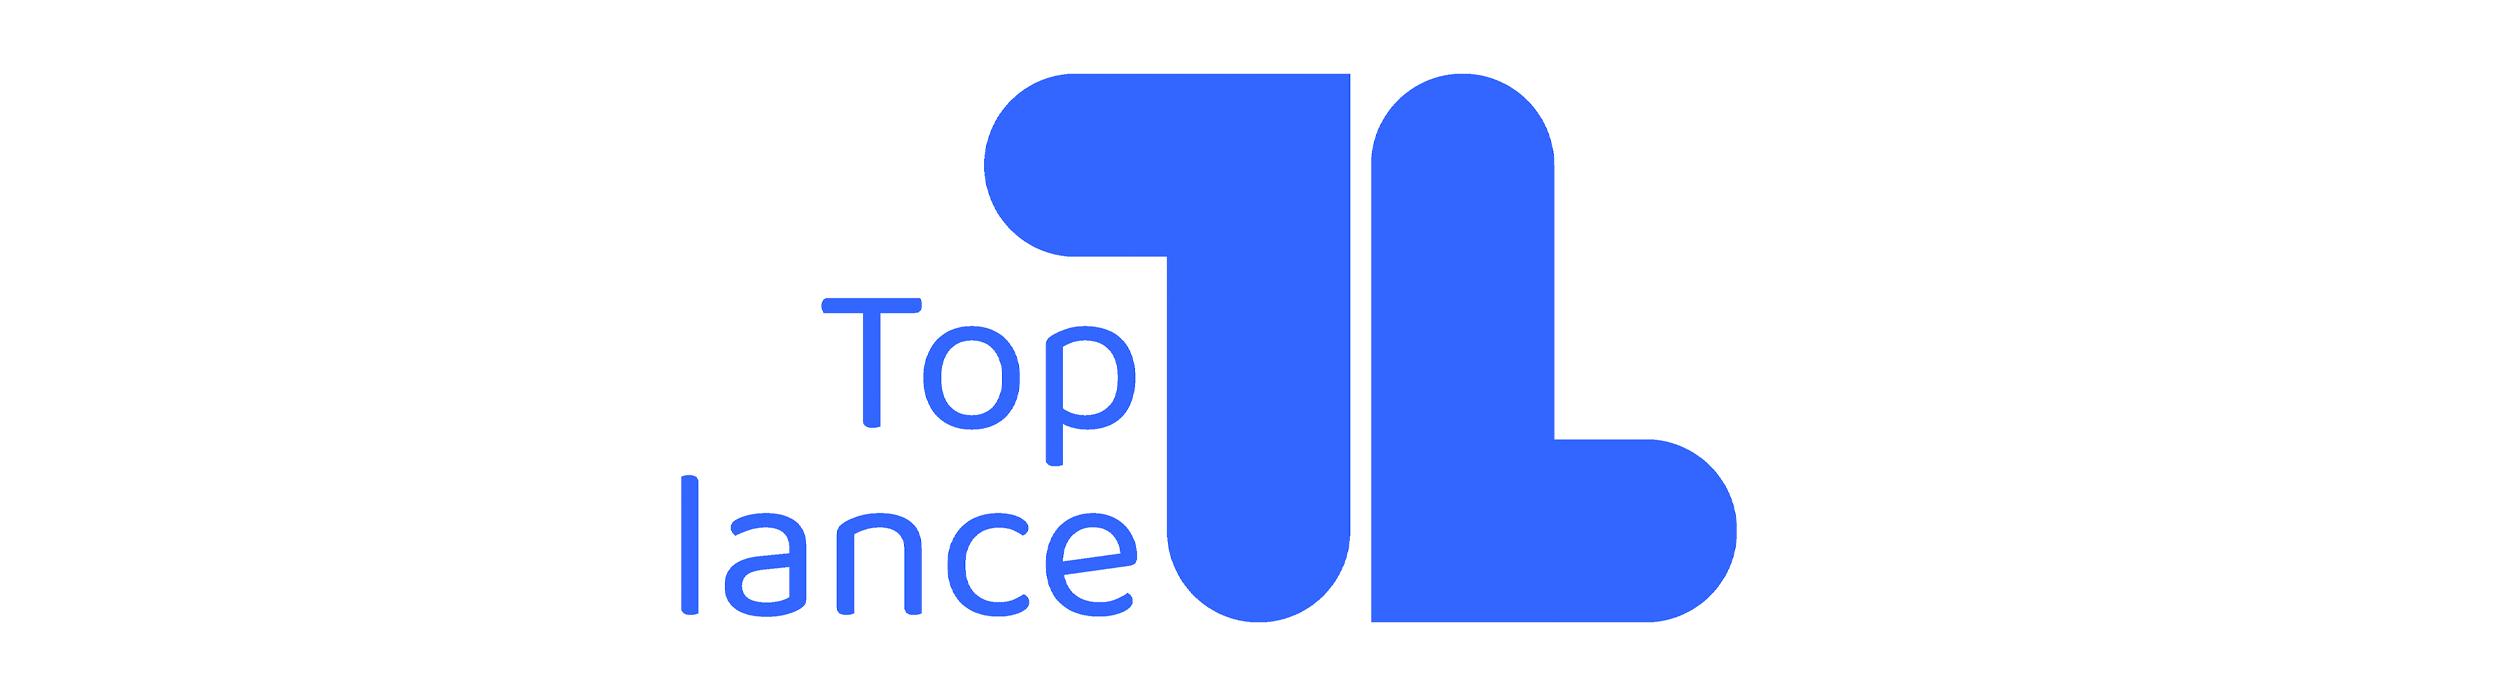 Toplance